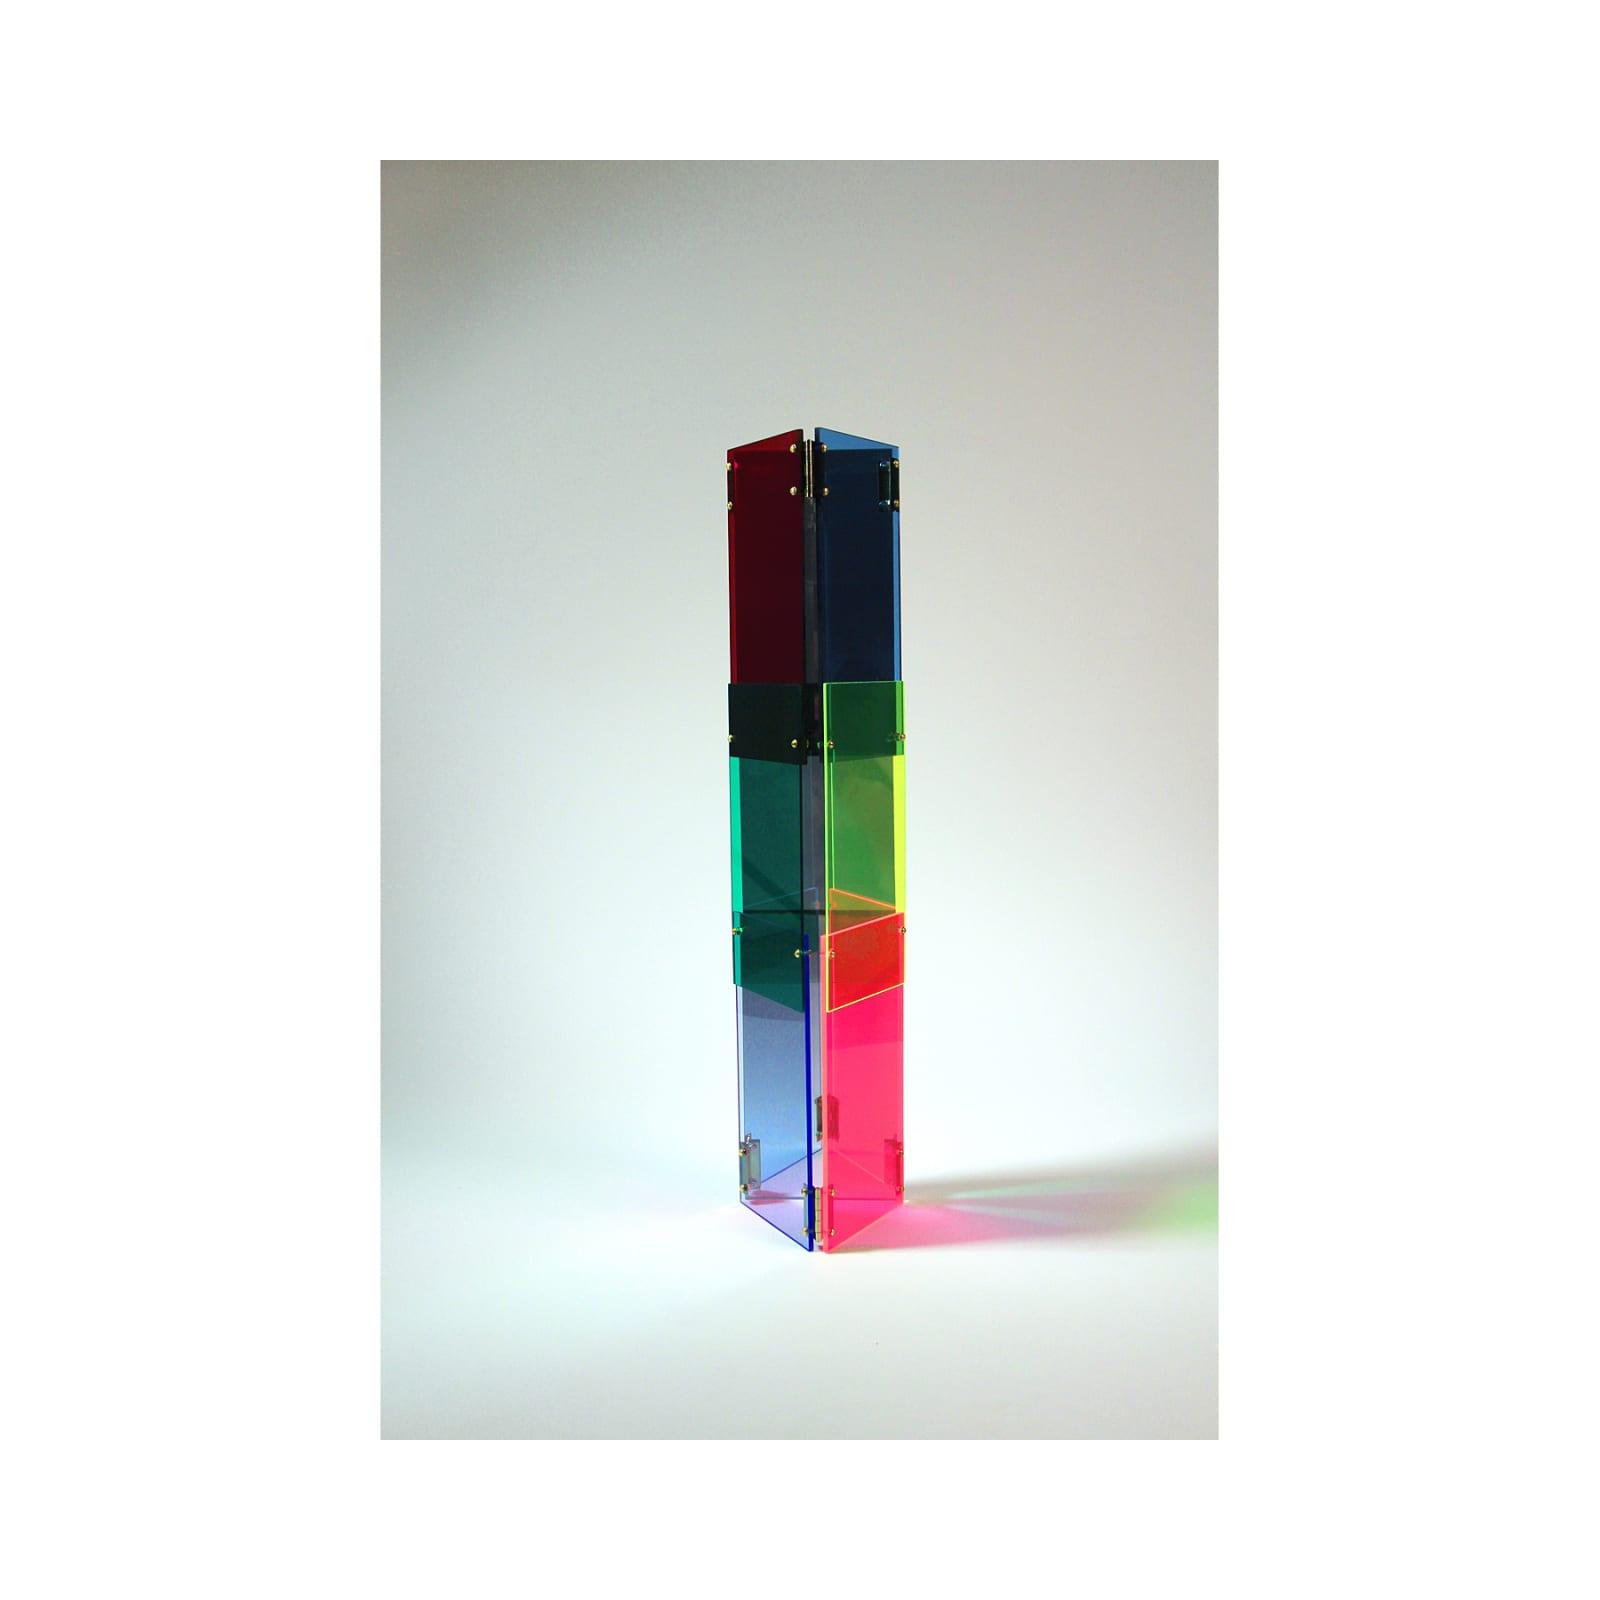 Anne Katrine Senstad  Babel 06, 2020  Lucite/Plexiglas, mirrors, brass door hinges, brass screws, bolts and washers  30 x 7 x 8 in  76.2 x 17.8 x 20.3 cm  Series: Circle of Babel